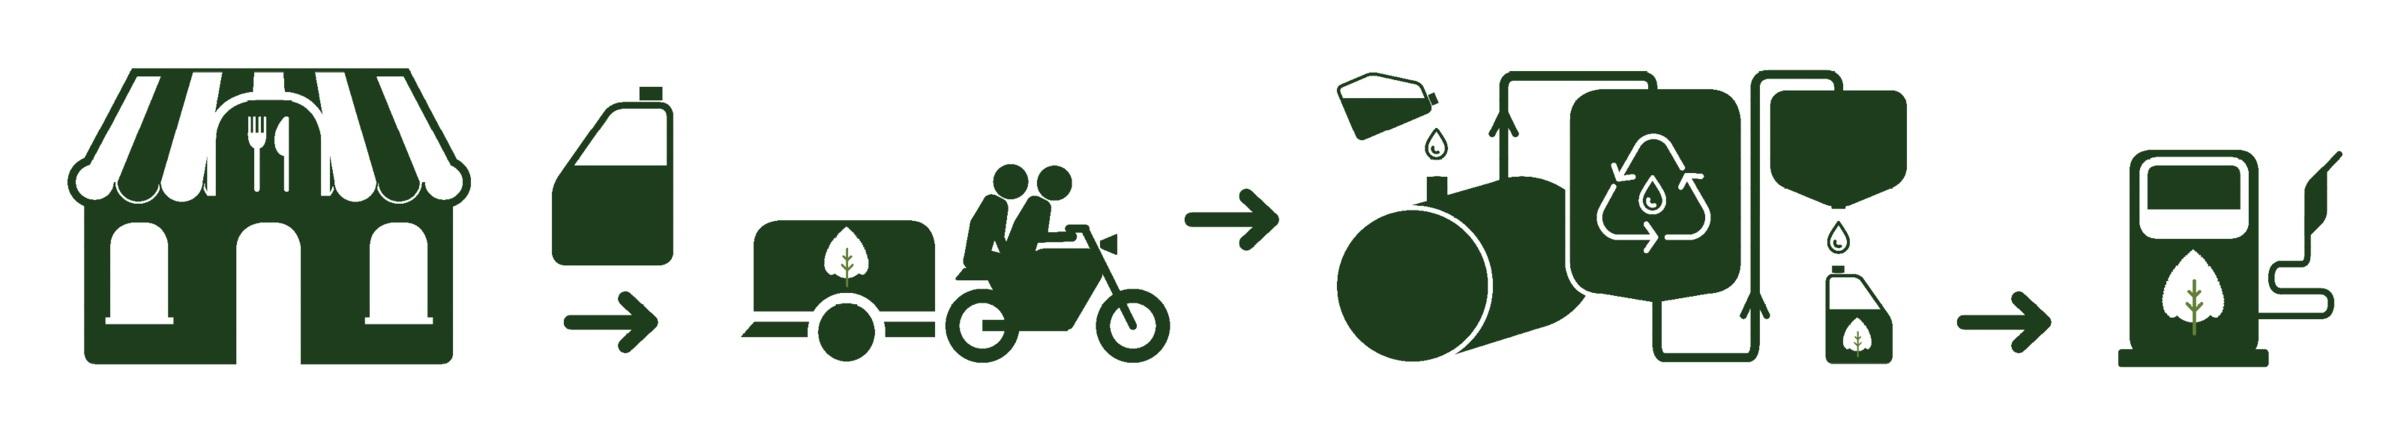 Biodiesel+project+icons_naga+earth.jpg